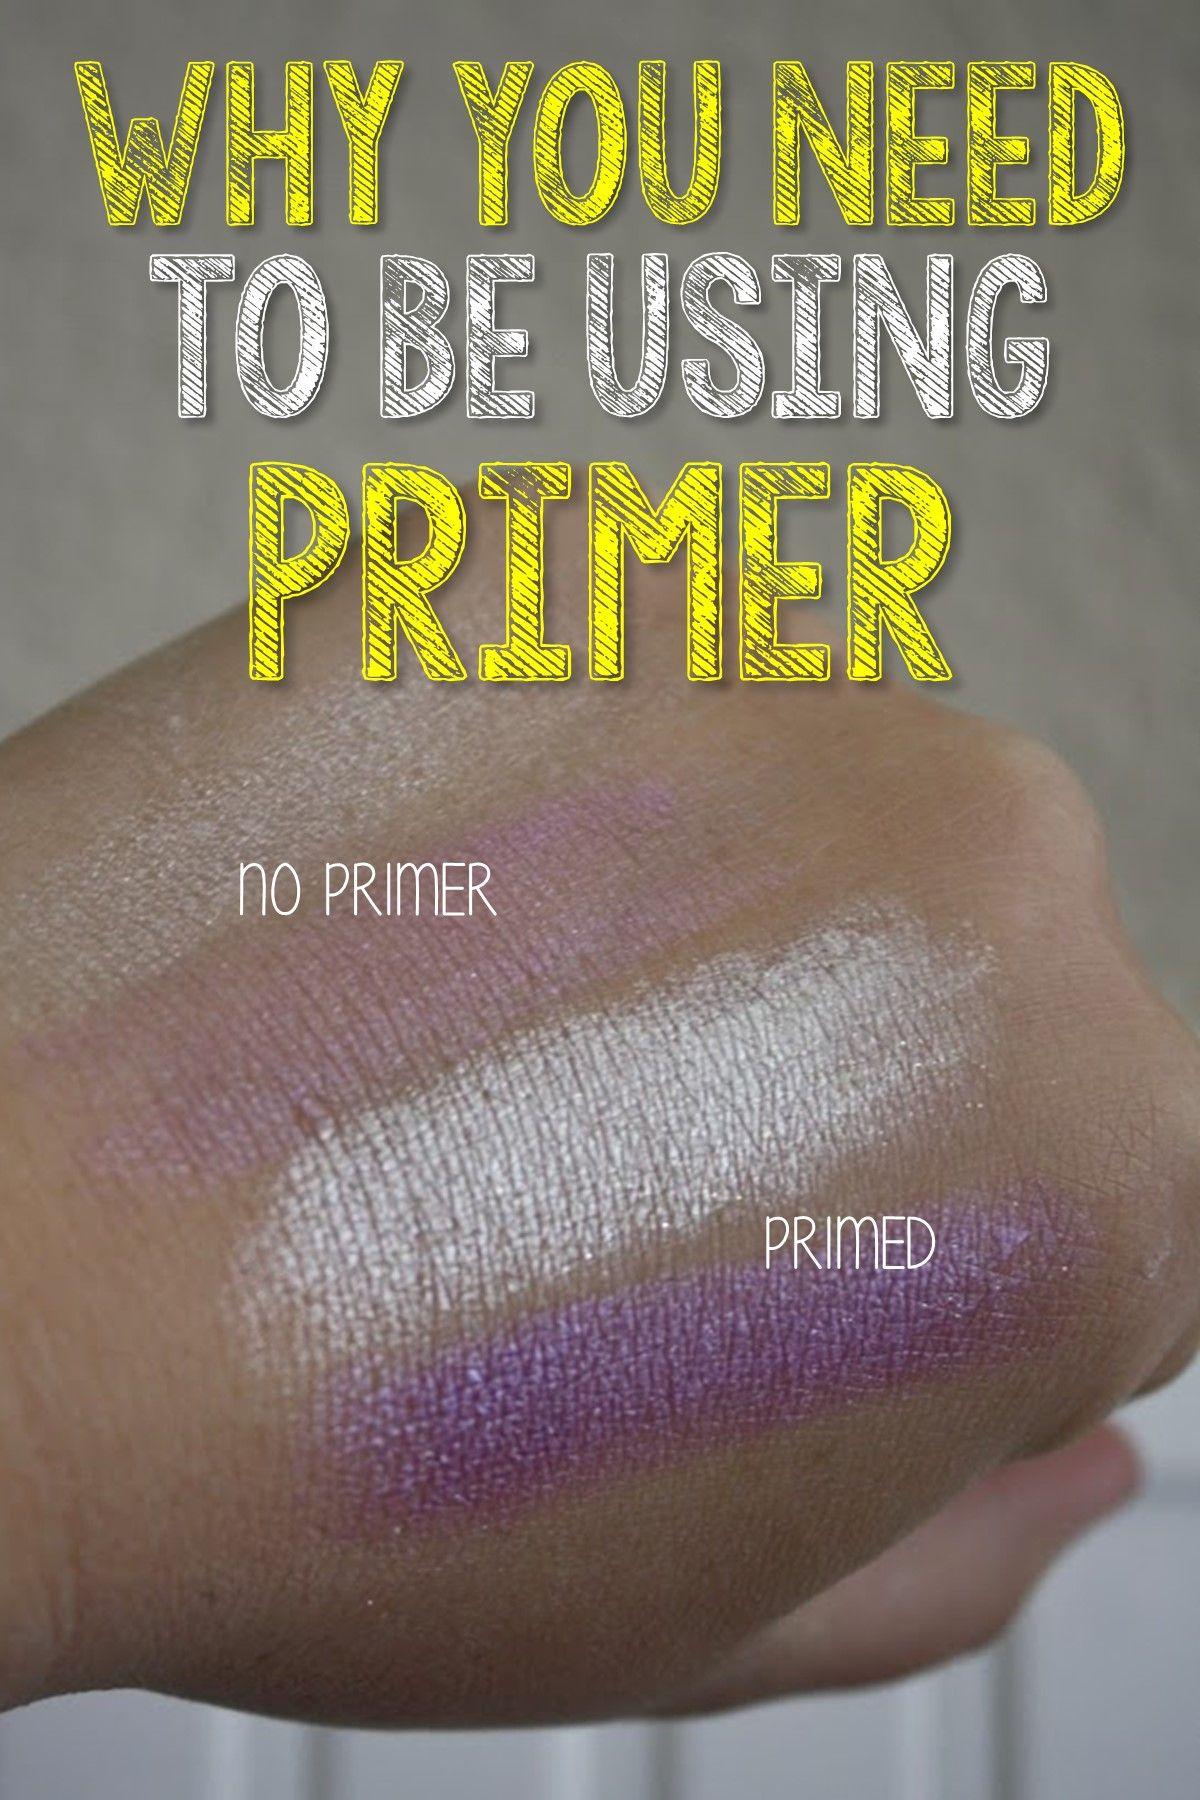 arbonne makeup primer instructions